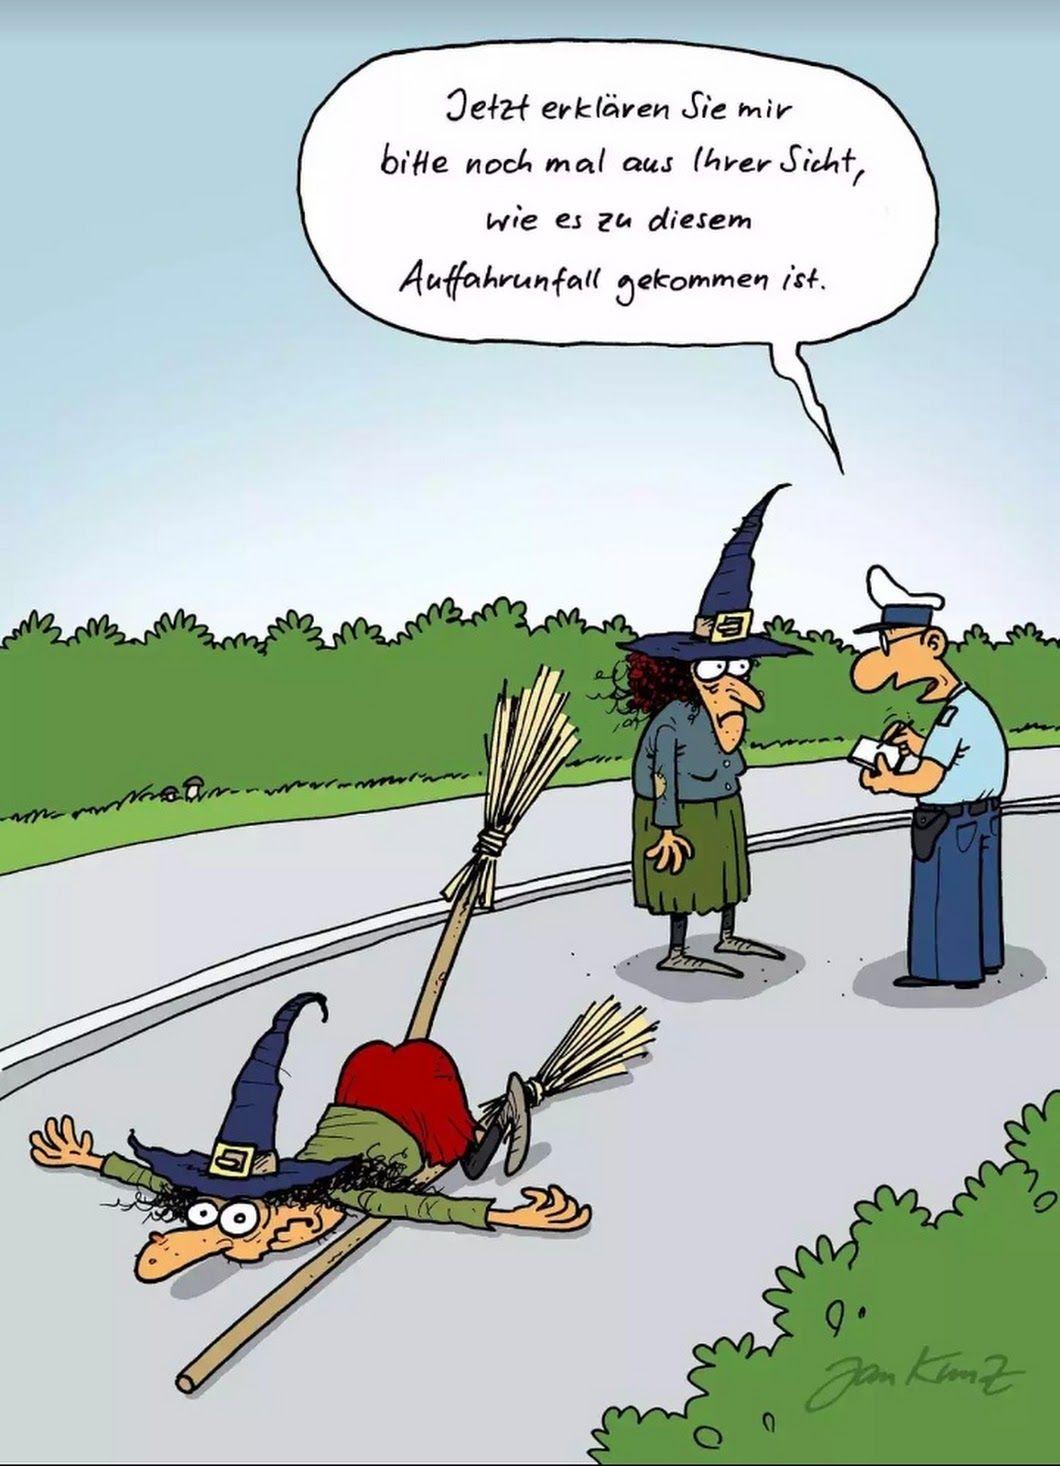 Dumm gelaufen 😂😂😂 | Witze lustig, Lustig humor, Humor bilder